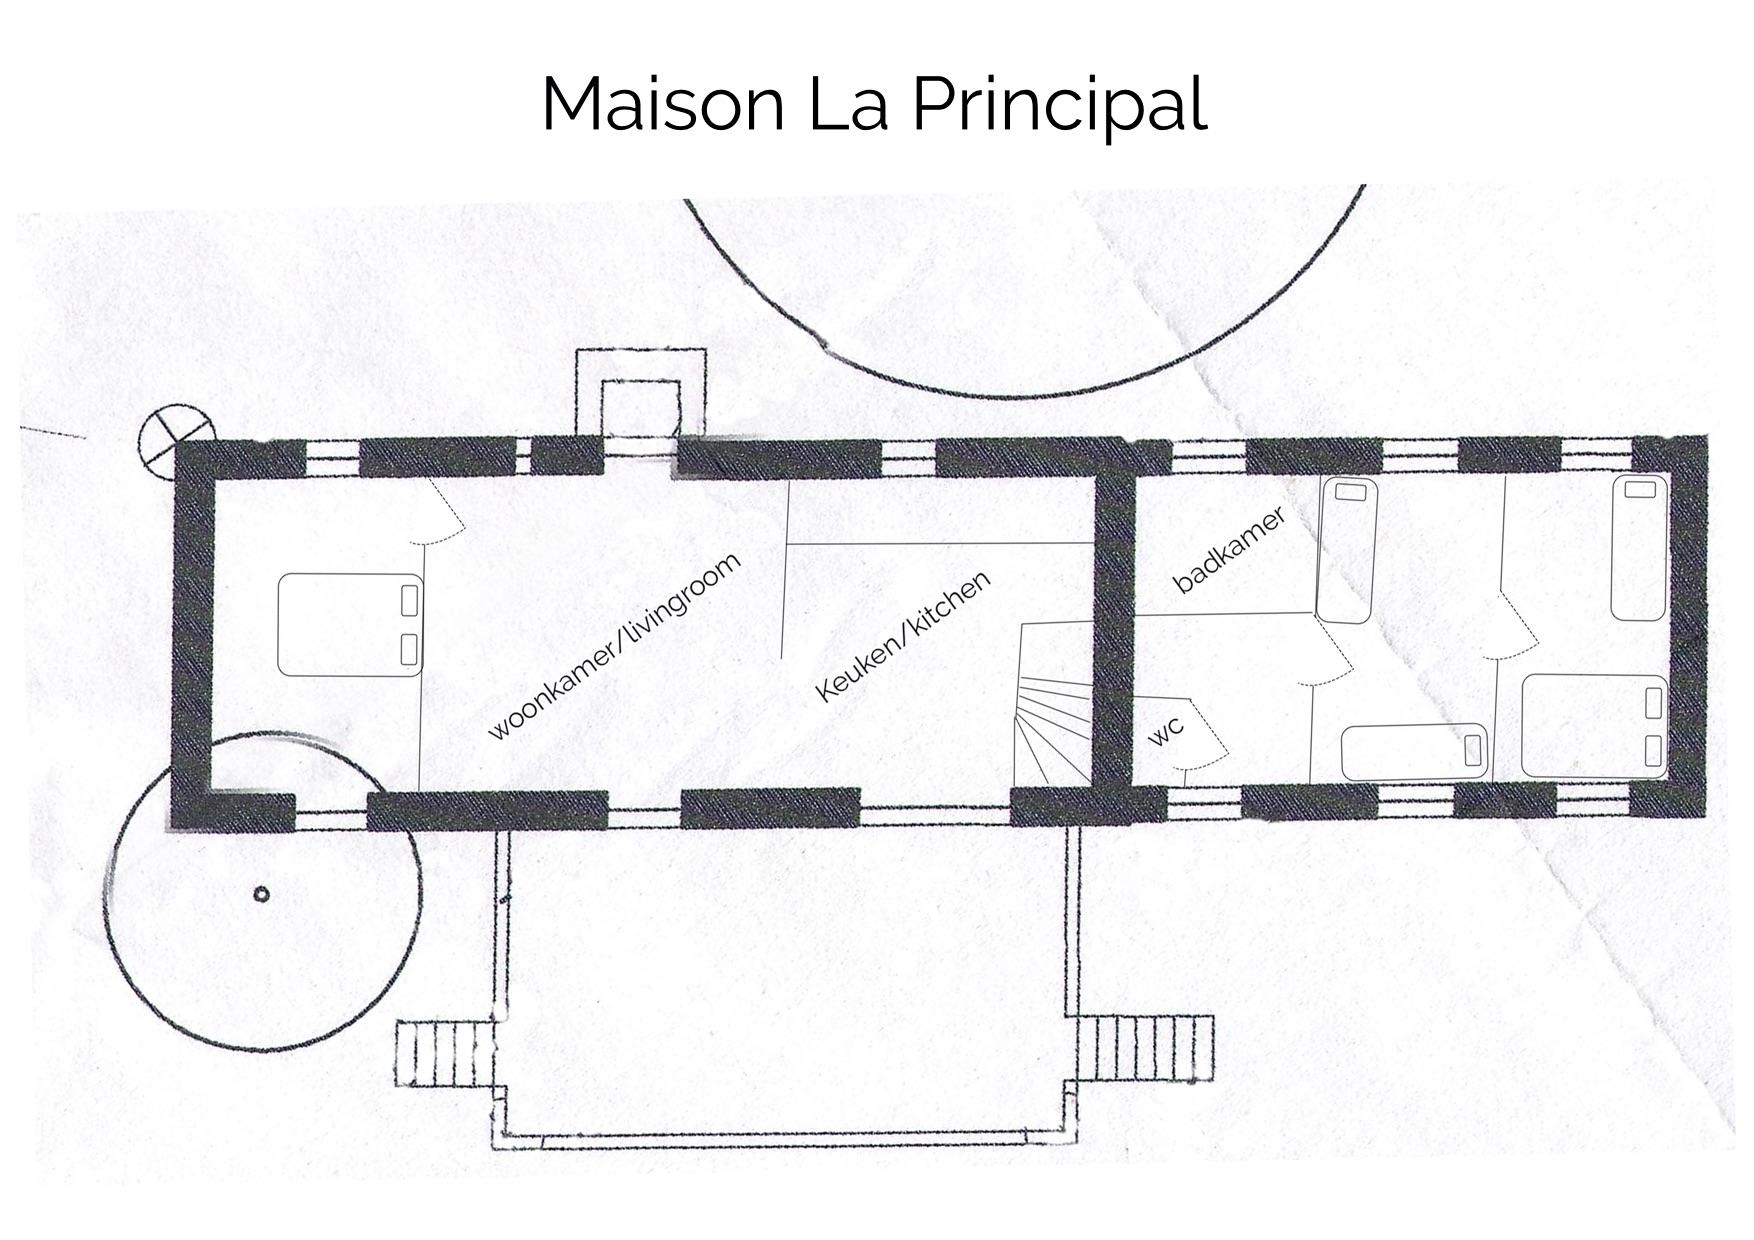 Gengiraud plattegrond maison la Prancipal copy 2.jpg